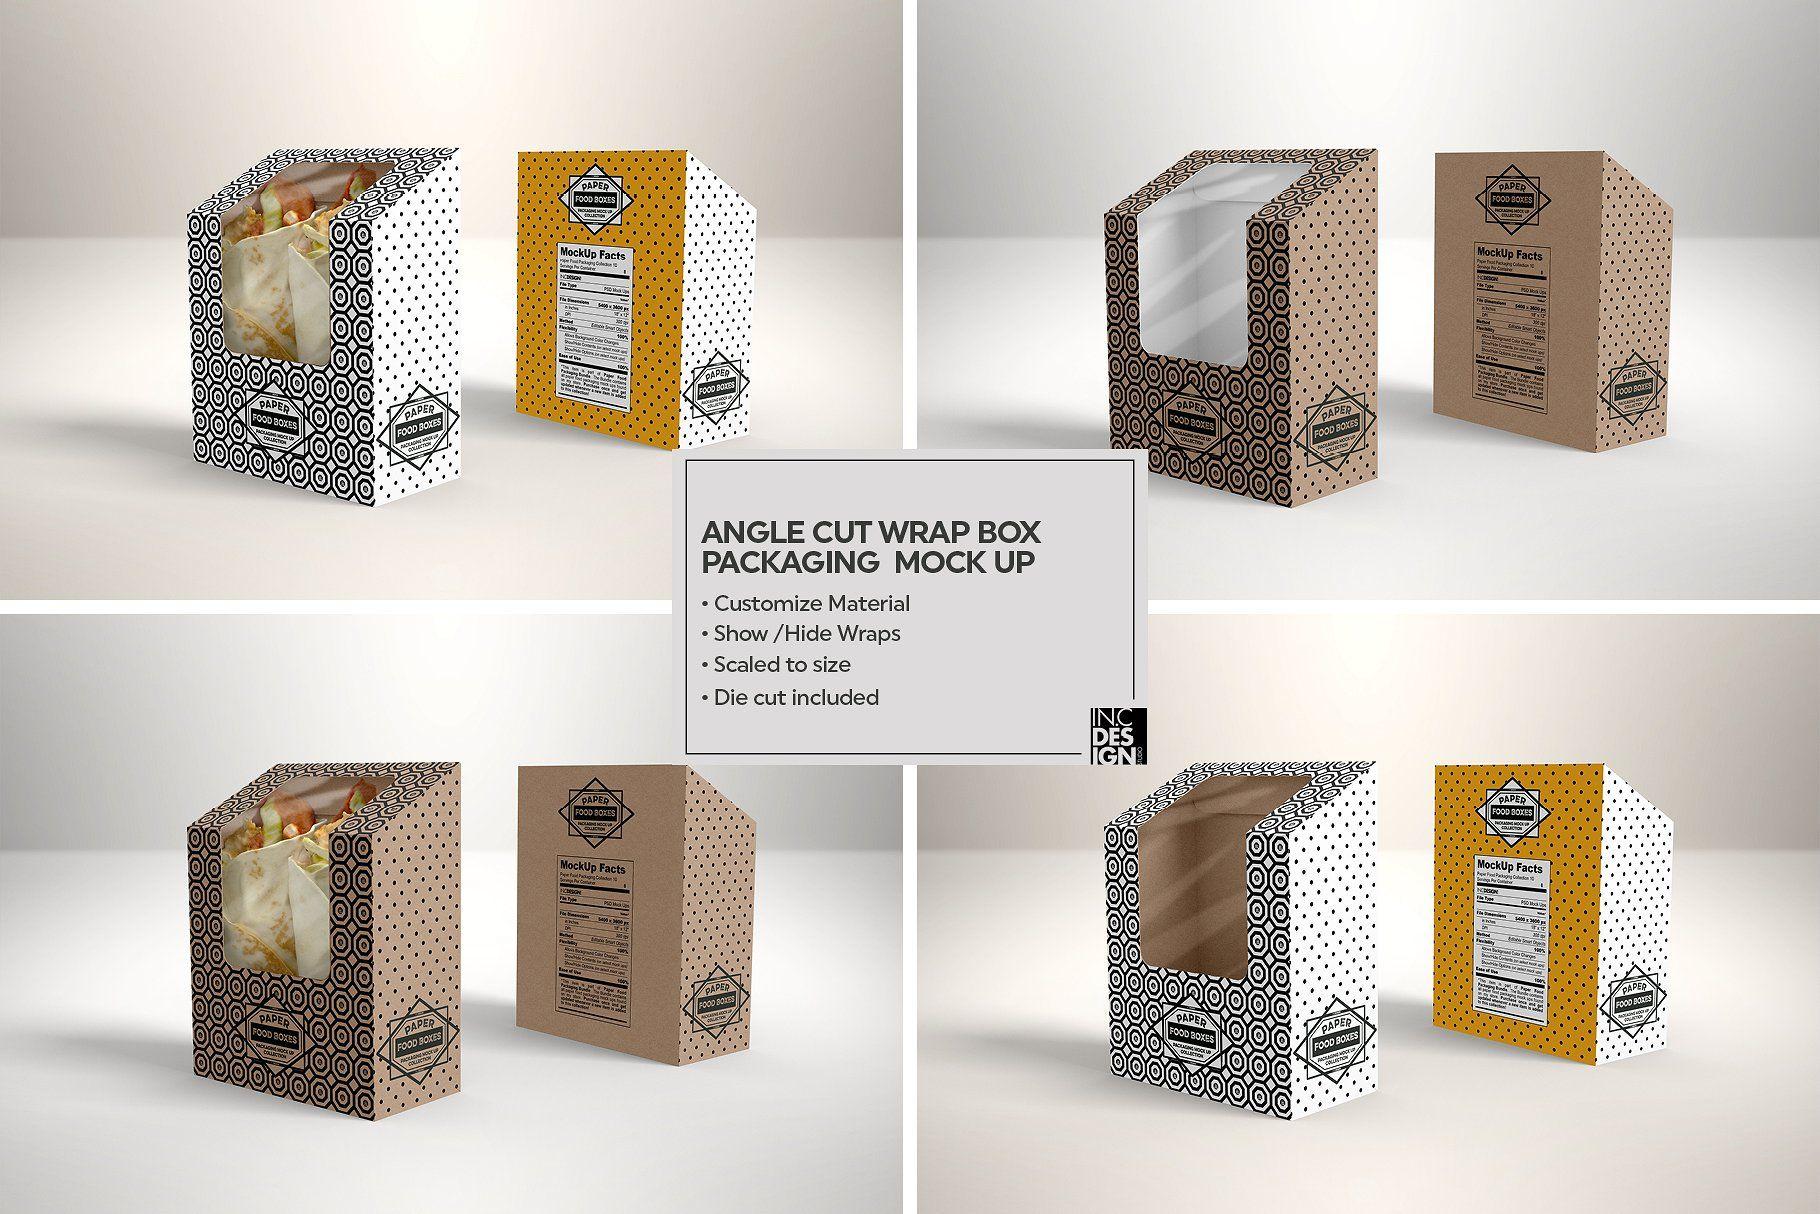 Download Vol 10 Food Box Packaging Mockups Food Box Packaging Packaging Mockup Free Packaging Mockup